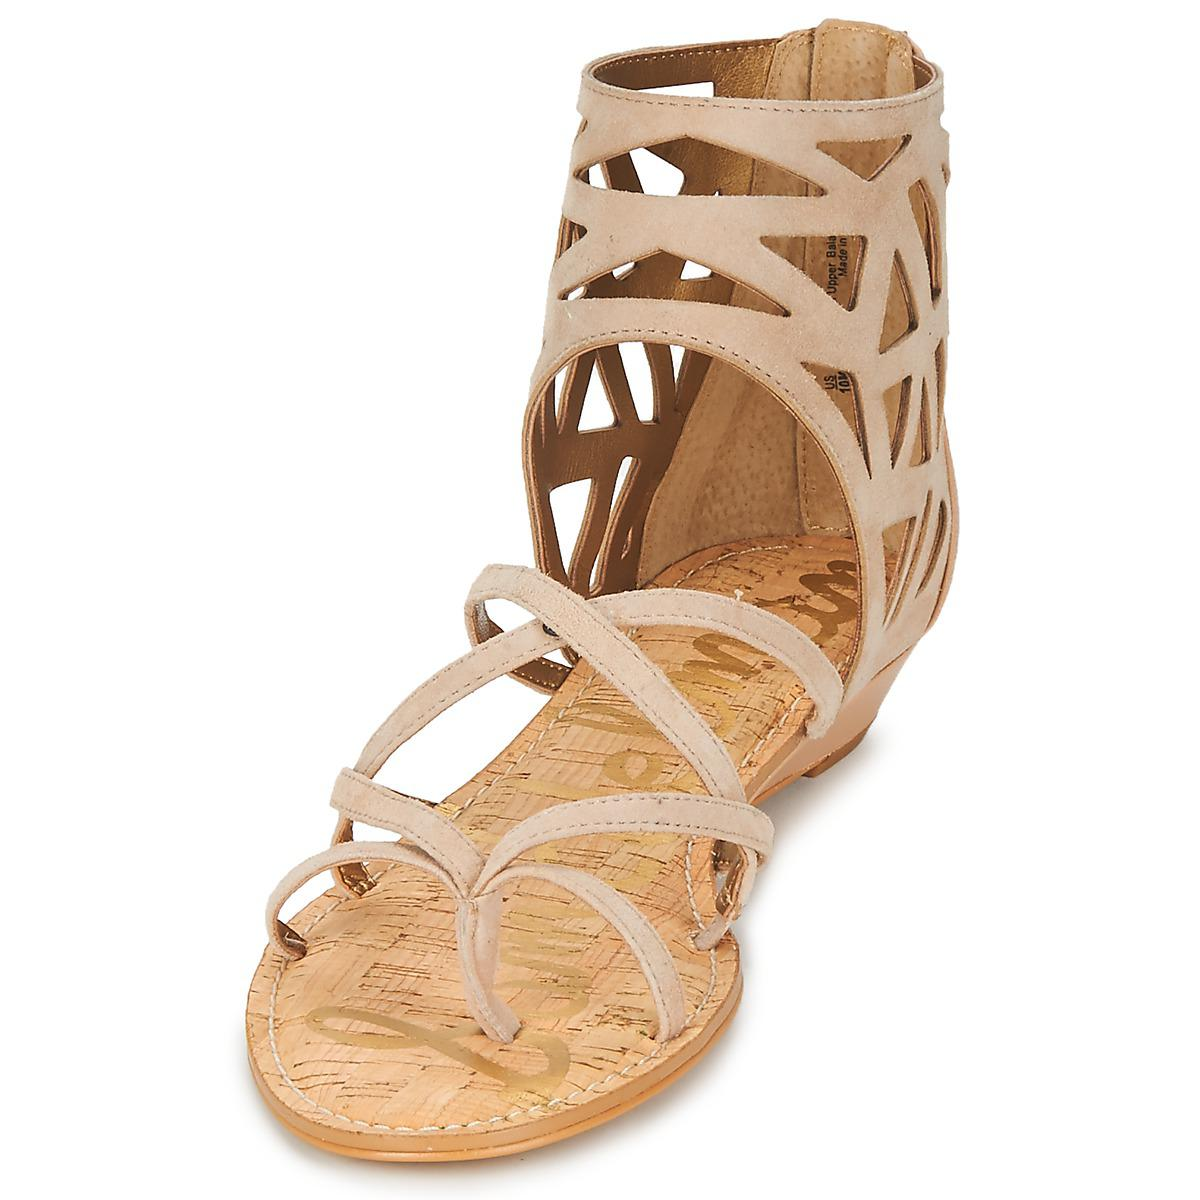 Wnym0v8no Sandals Natural In Lyst Iyvf7b6gym Sam Edelman Dana iOXTPZku